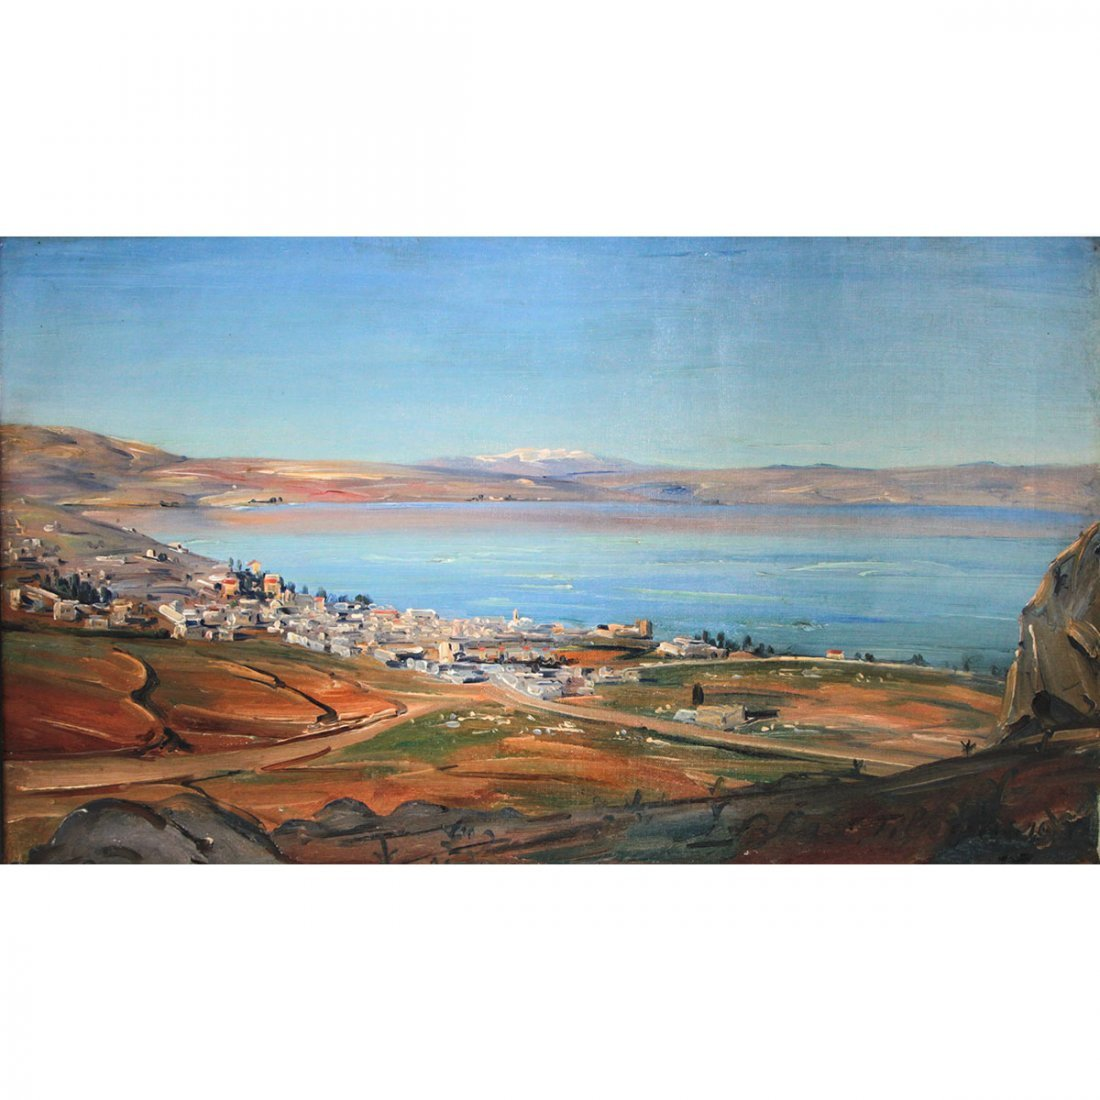 Ludwig Blum - Tiberius, Oil on Canvas.